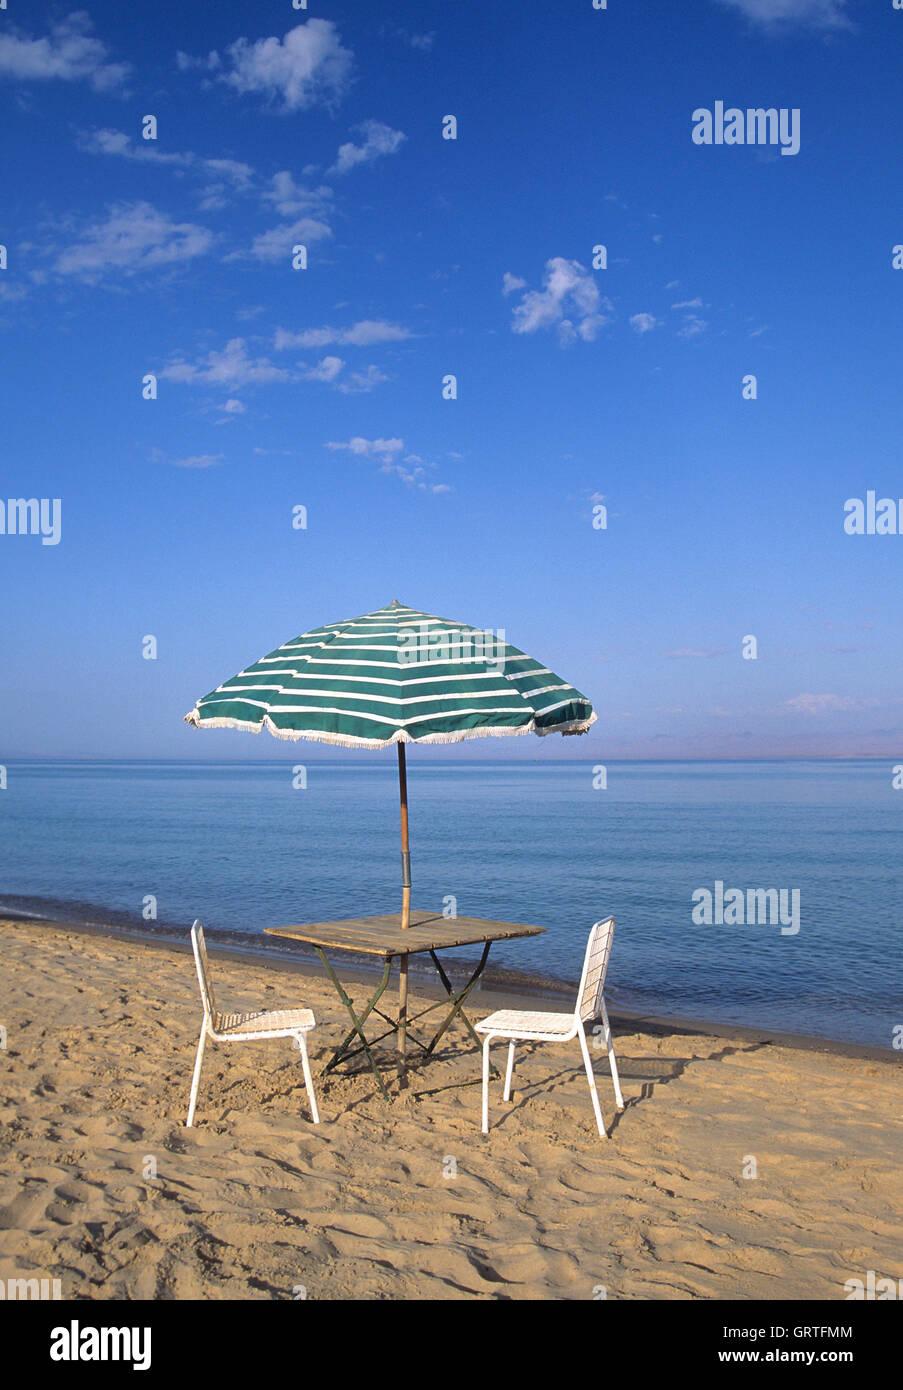 Beach, Nuweiba, Sinai, Egypt - Stock Image